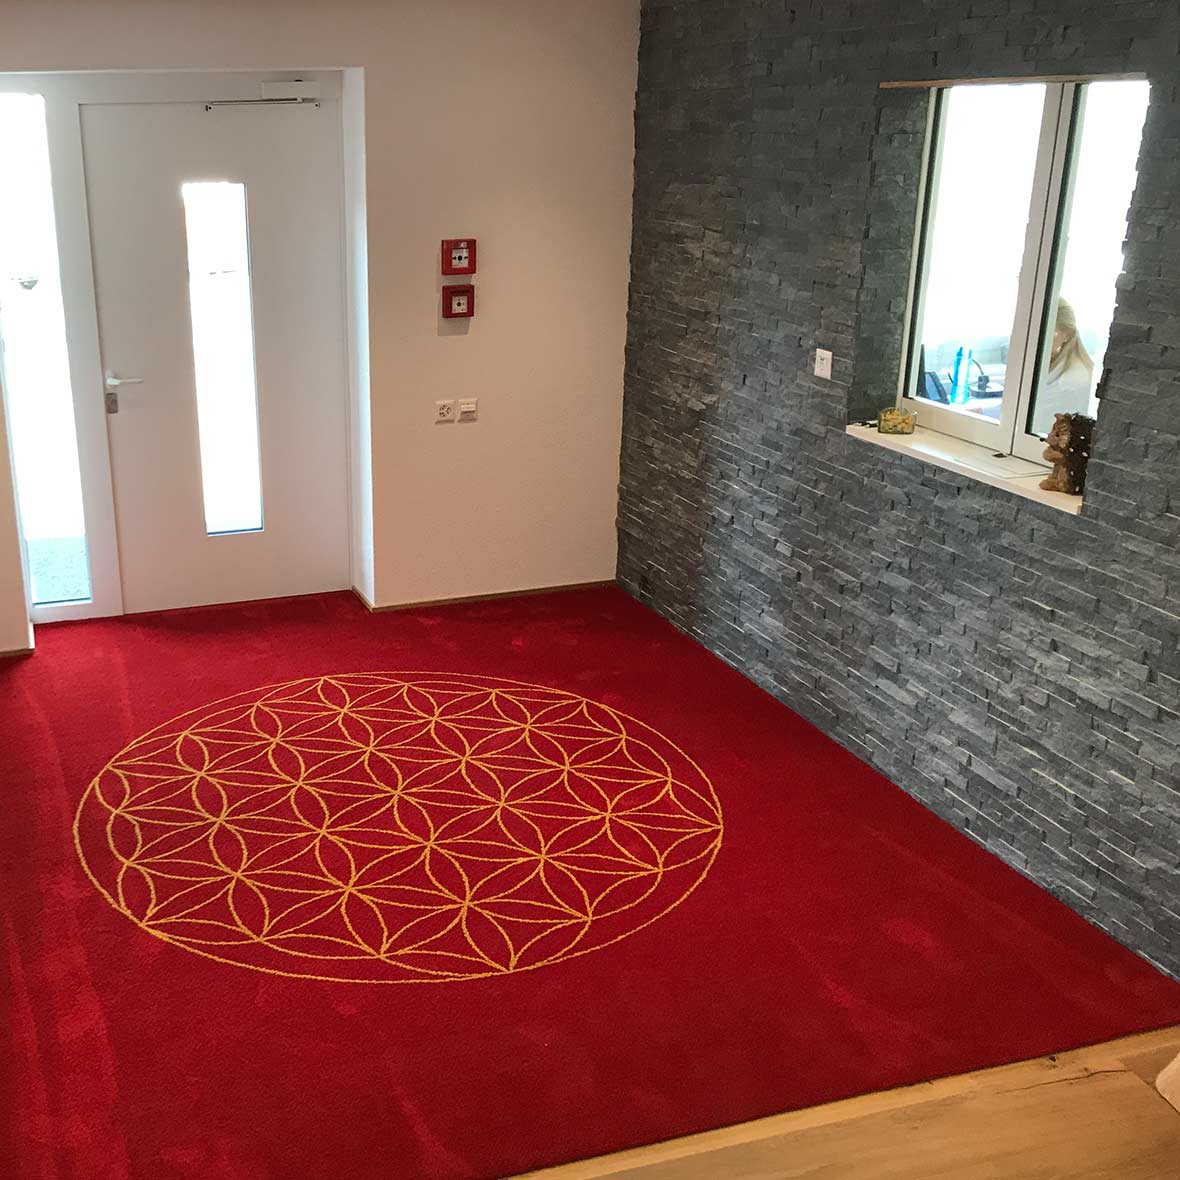 Teppich Lebensblume aus Schnurwolle - terrarot - erdgold - Eingang